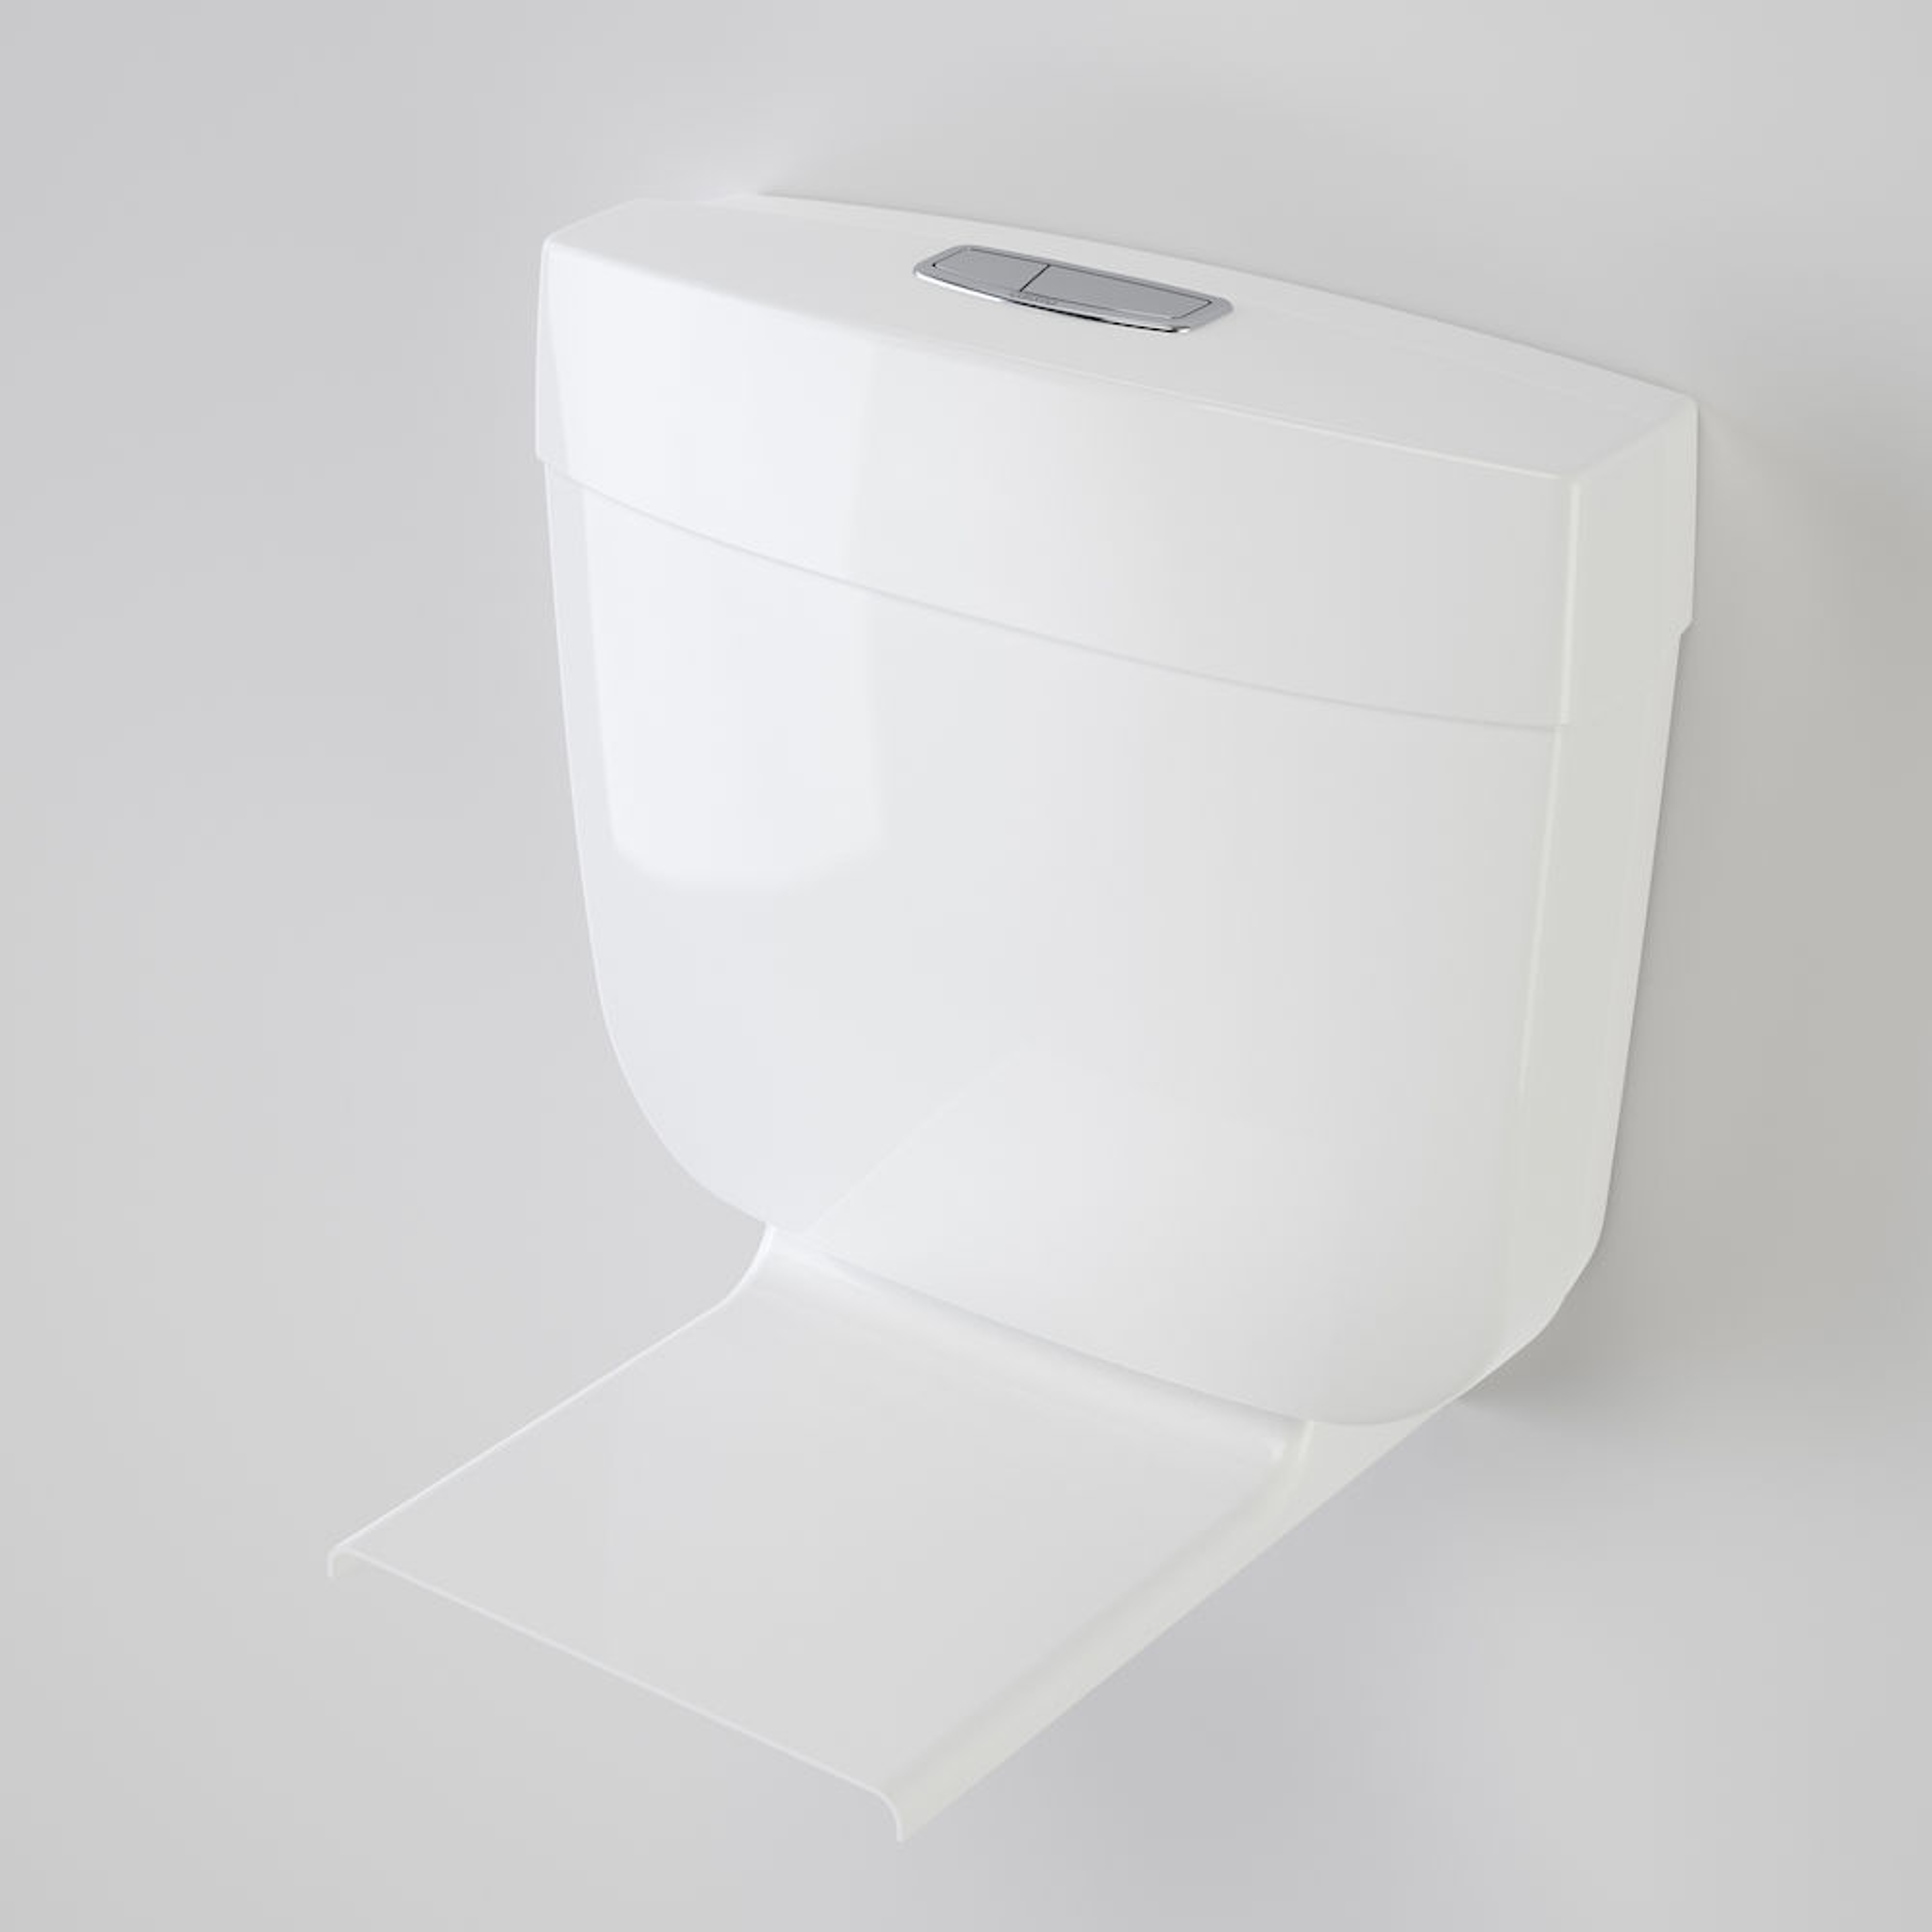 Caroma Slimline Connector Plastic 4.5/3L Dual Flush Cistern